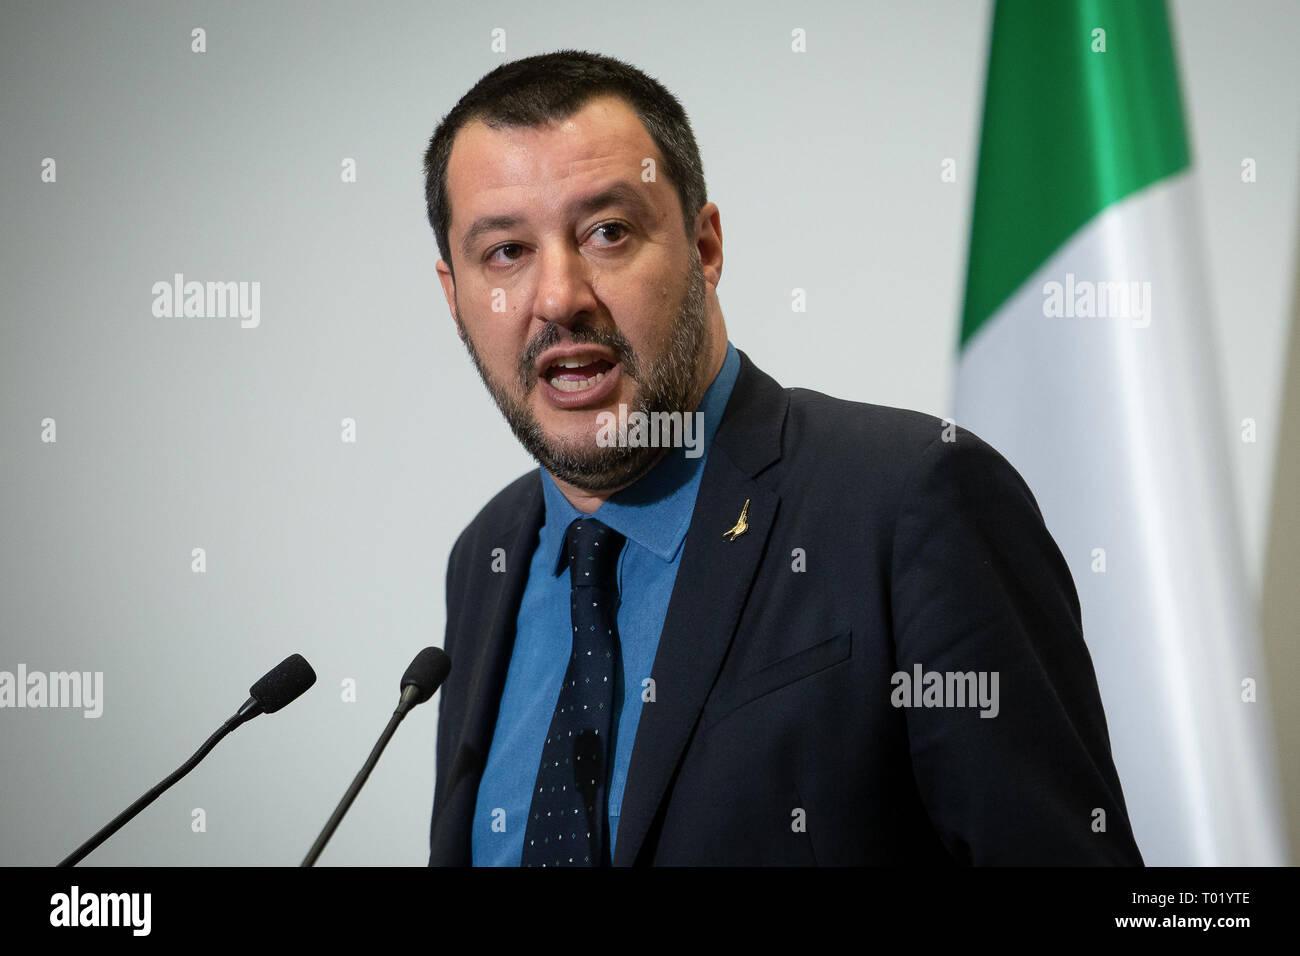 El Viceprimer Ministro italiano Matteo Salvini durante la conferencia de prensa con el Ministro del Interior polaco Joachim Brudzinski al Ministerio del Interior en Varsovia, Polonia, del 9 de enero de 2019 Imagen De Stock